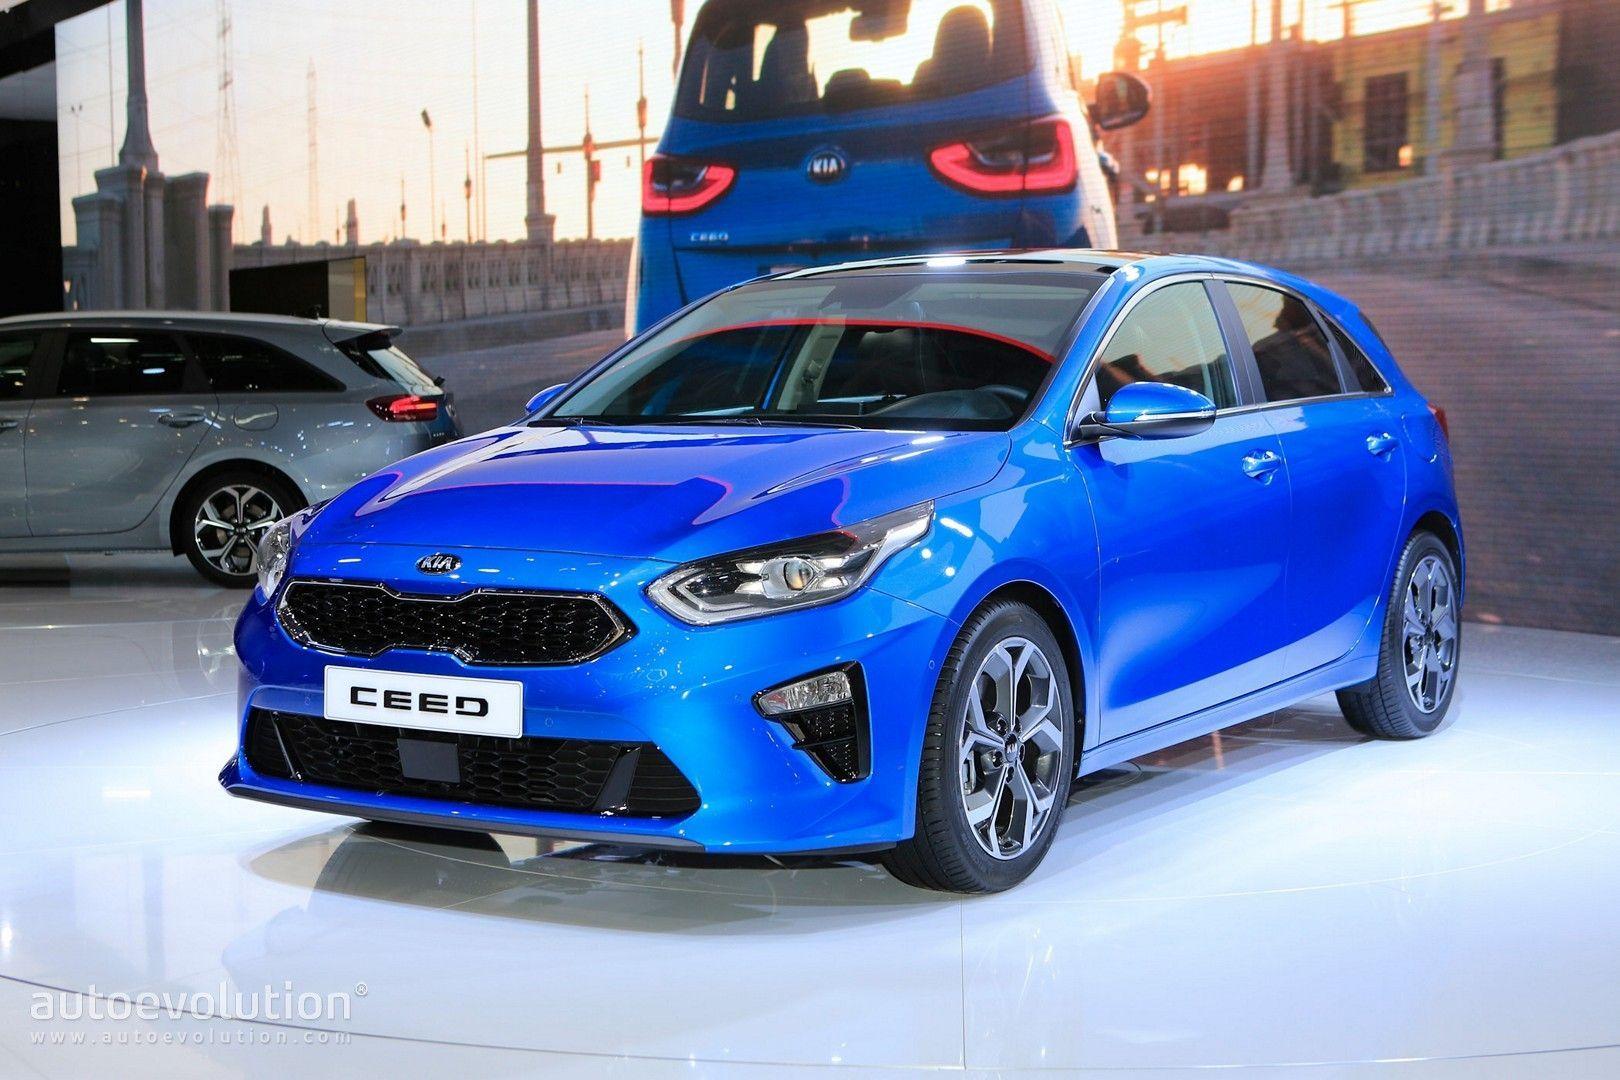 2019 Kia Forte5 Performance And New Engine Best 2019 Kia Forte5 New Concept Kia New Engine Hatchback